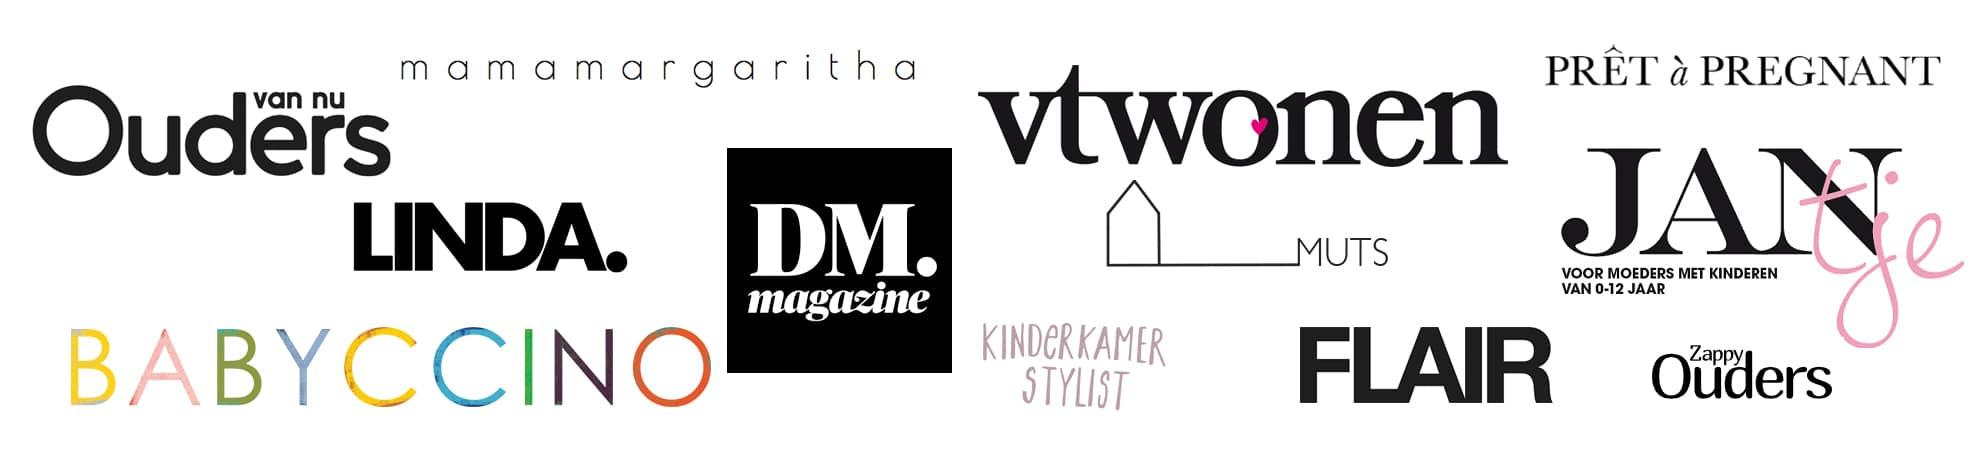 MrStarskyAmsterdam featured in linda flair kinderkamerstylist babyccino